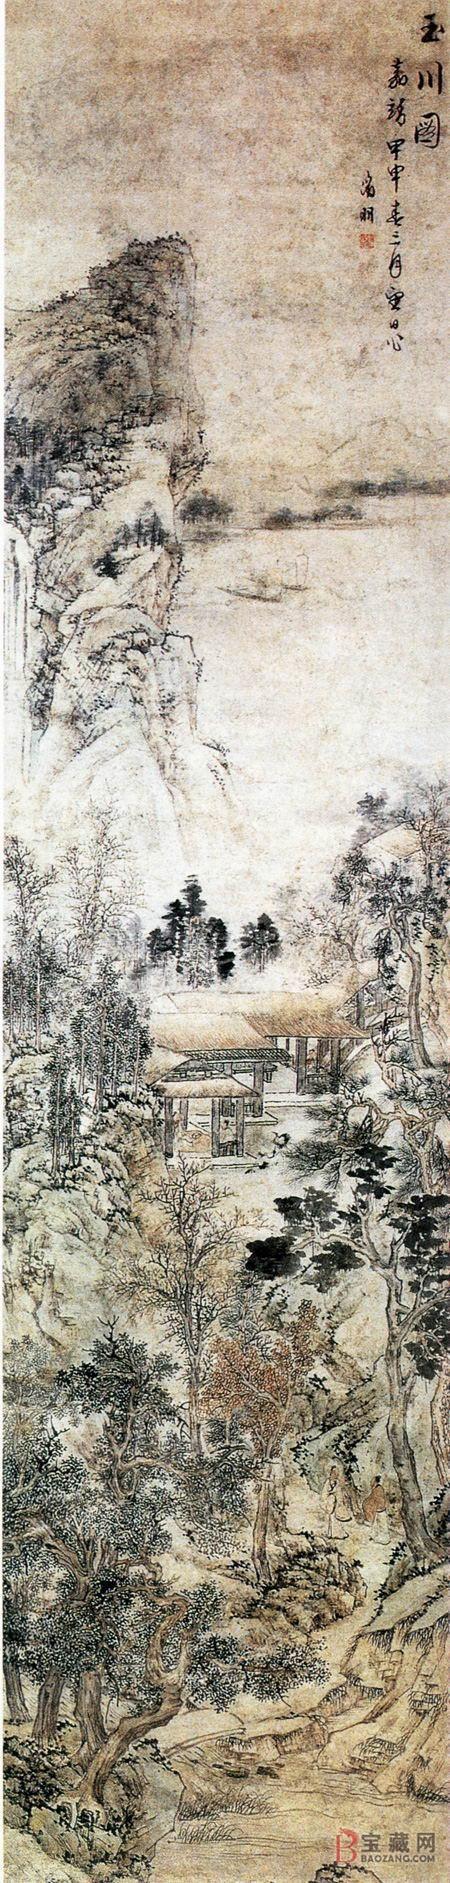 Watercolor art history brush - Wen Zhengming